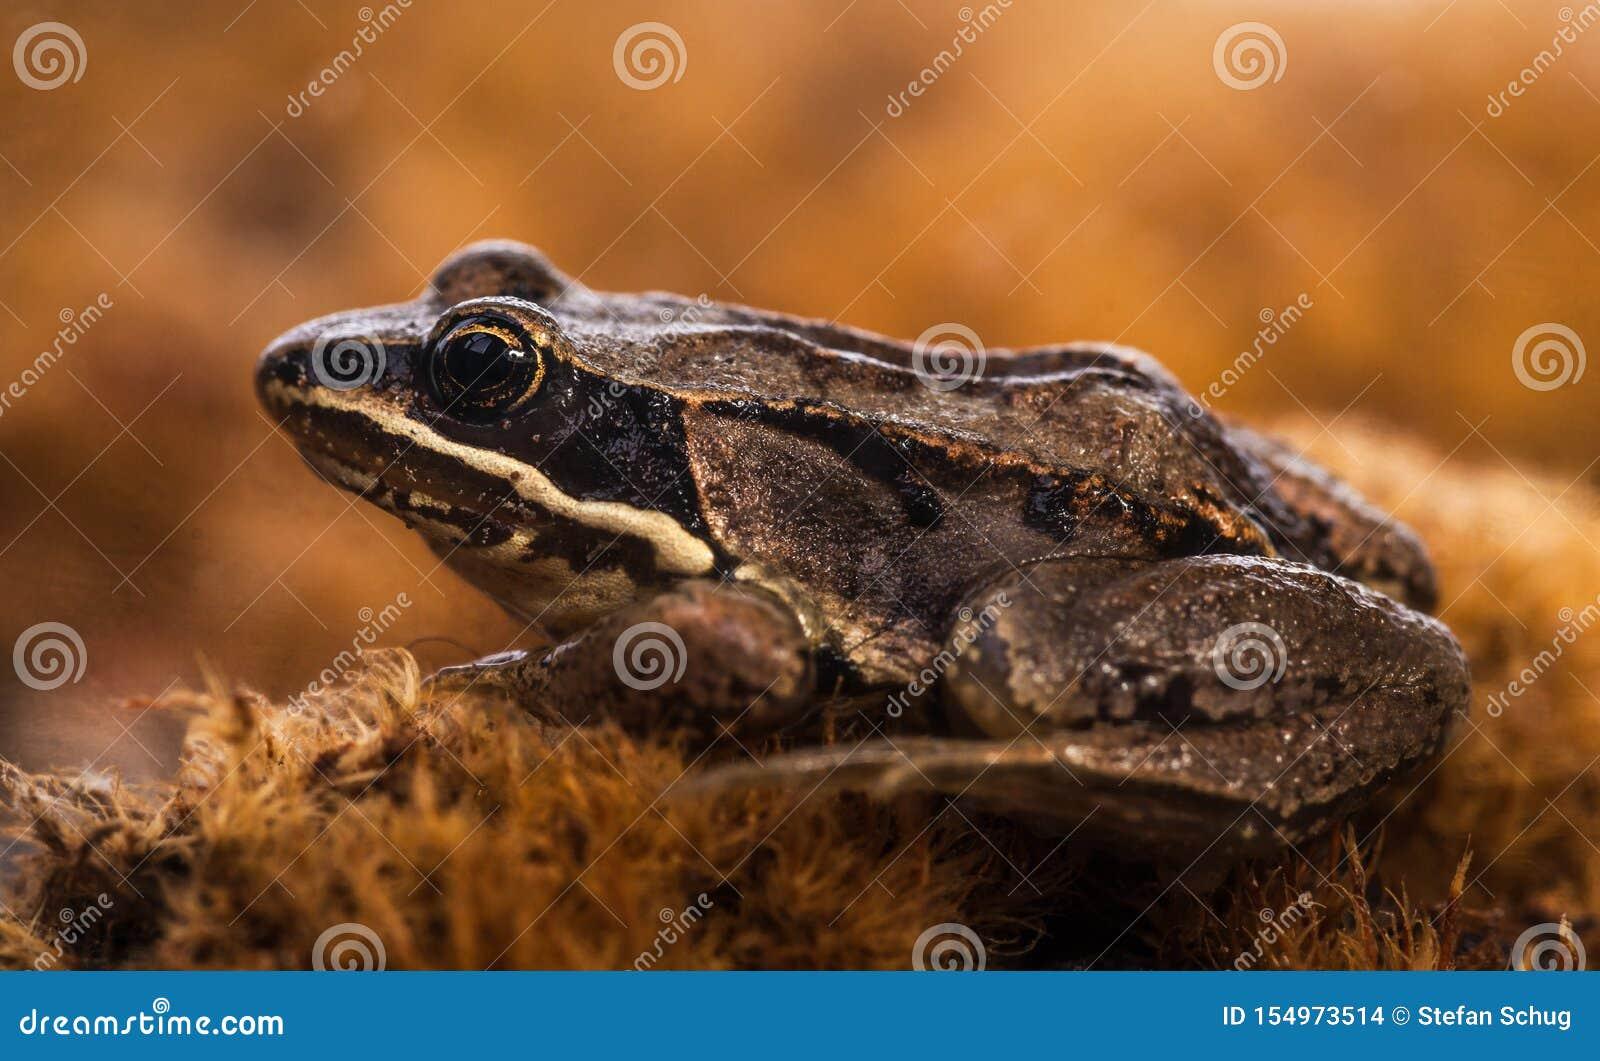 Nordleopard-Frosch - Nahaufnahme